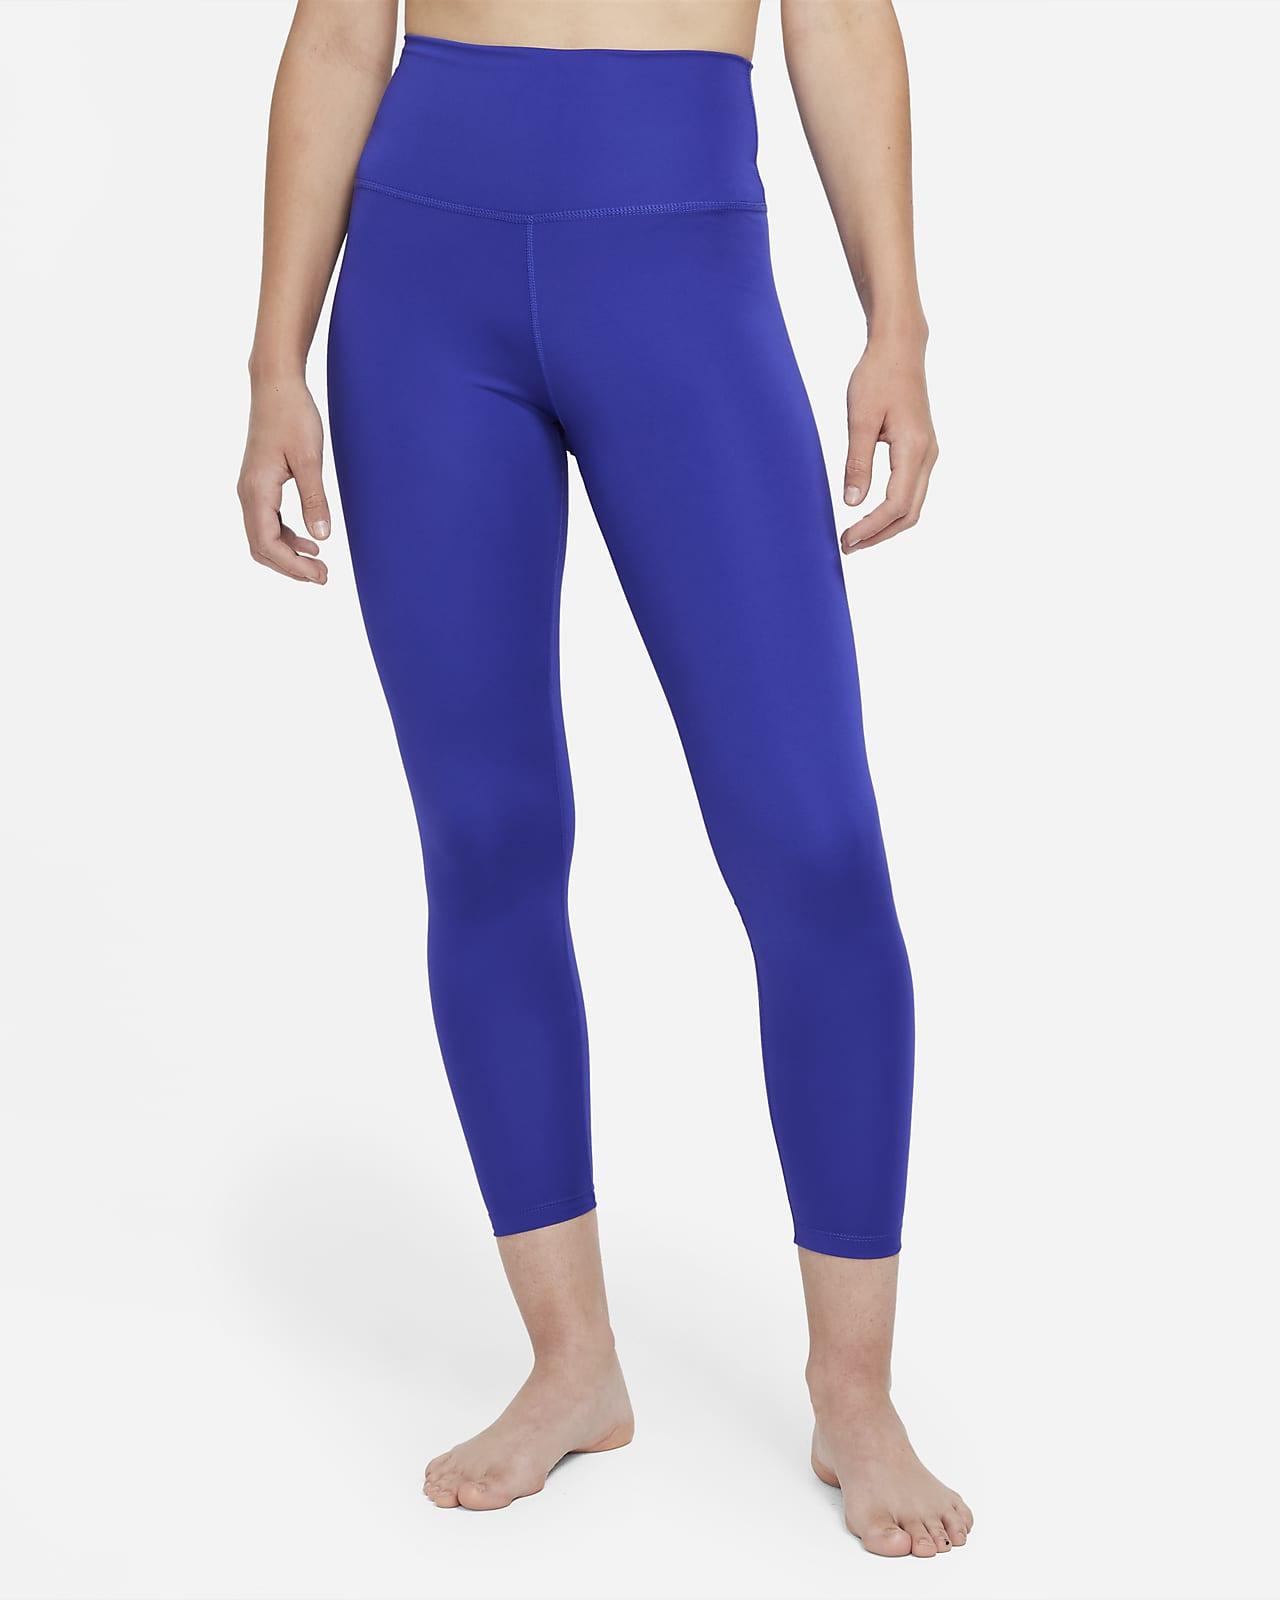 Nike Yoga 女款高腰九分內搭褲